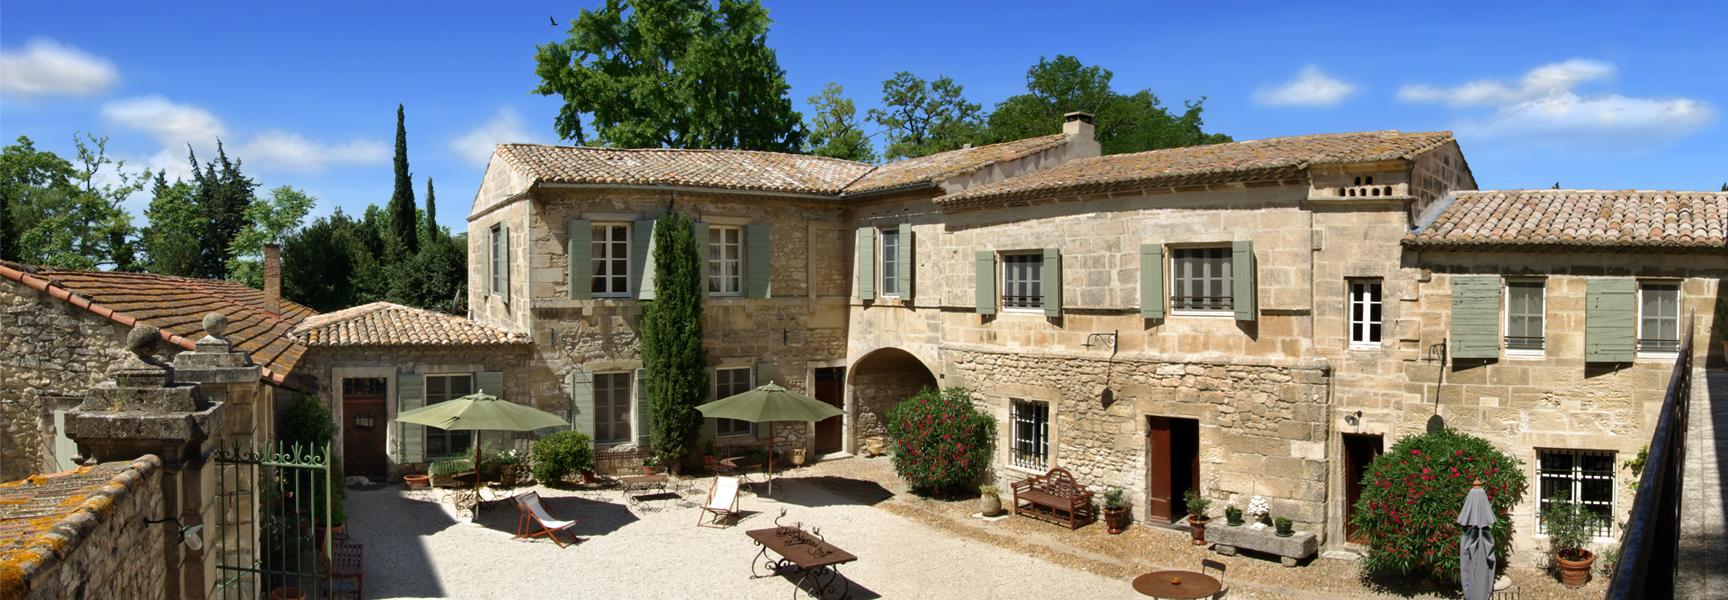 Le mas des comtes de provence hotel tarascon voir les for Photo de mas provencal